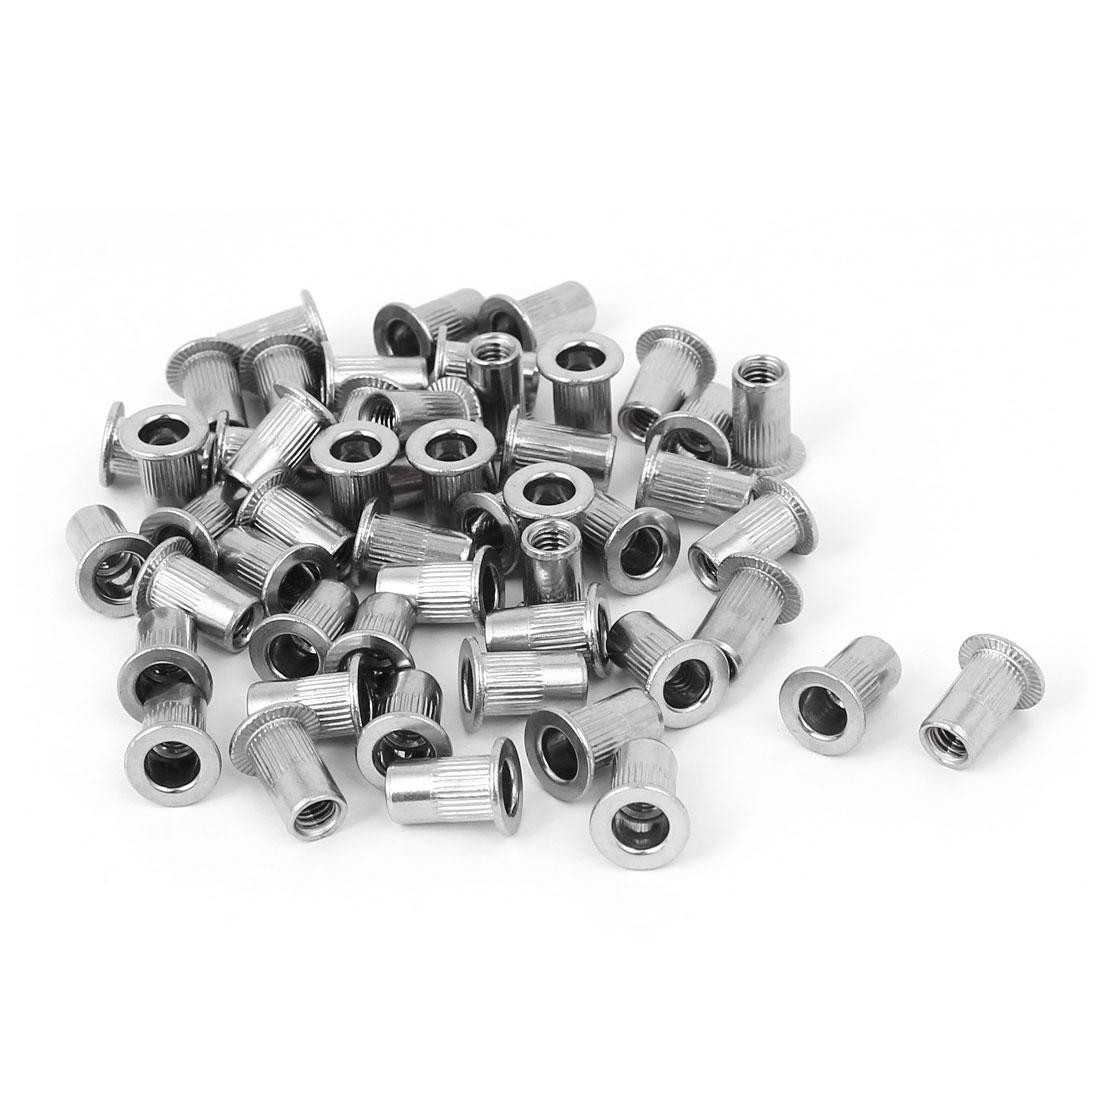 M4 x 11mm 304 Stainless Steel Knurled Rivet Nut Insert Nutsert 50PCS